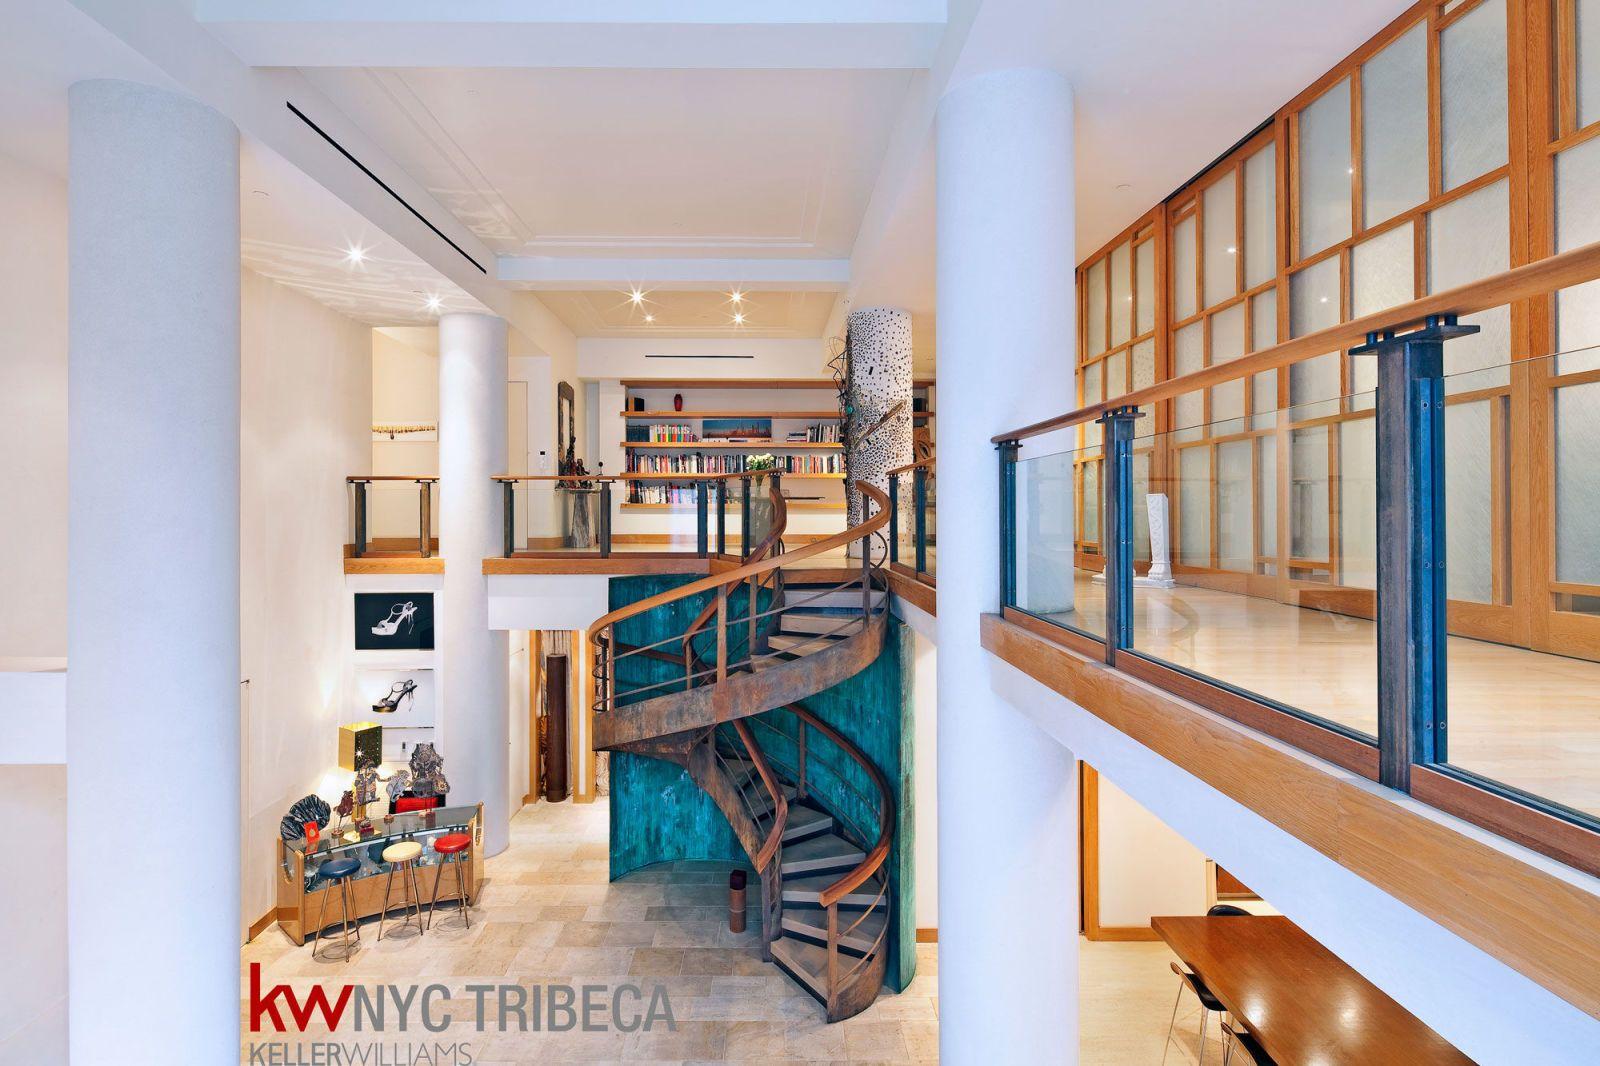 Take a Look Inside Keira Knightley's $6 Million New York City Apartment  - HarpersBAZAAR.com